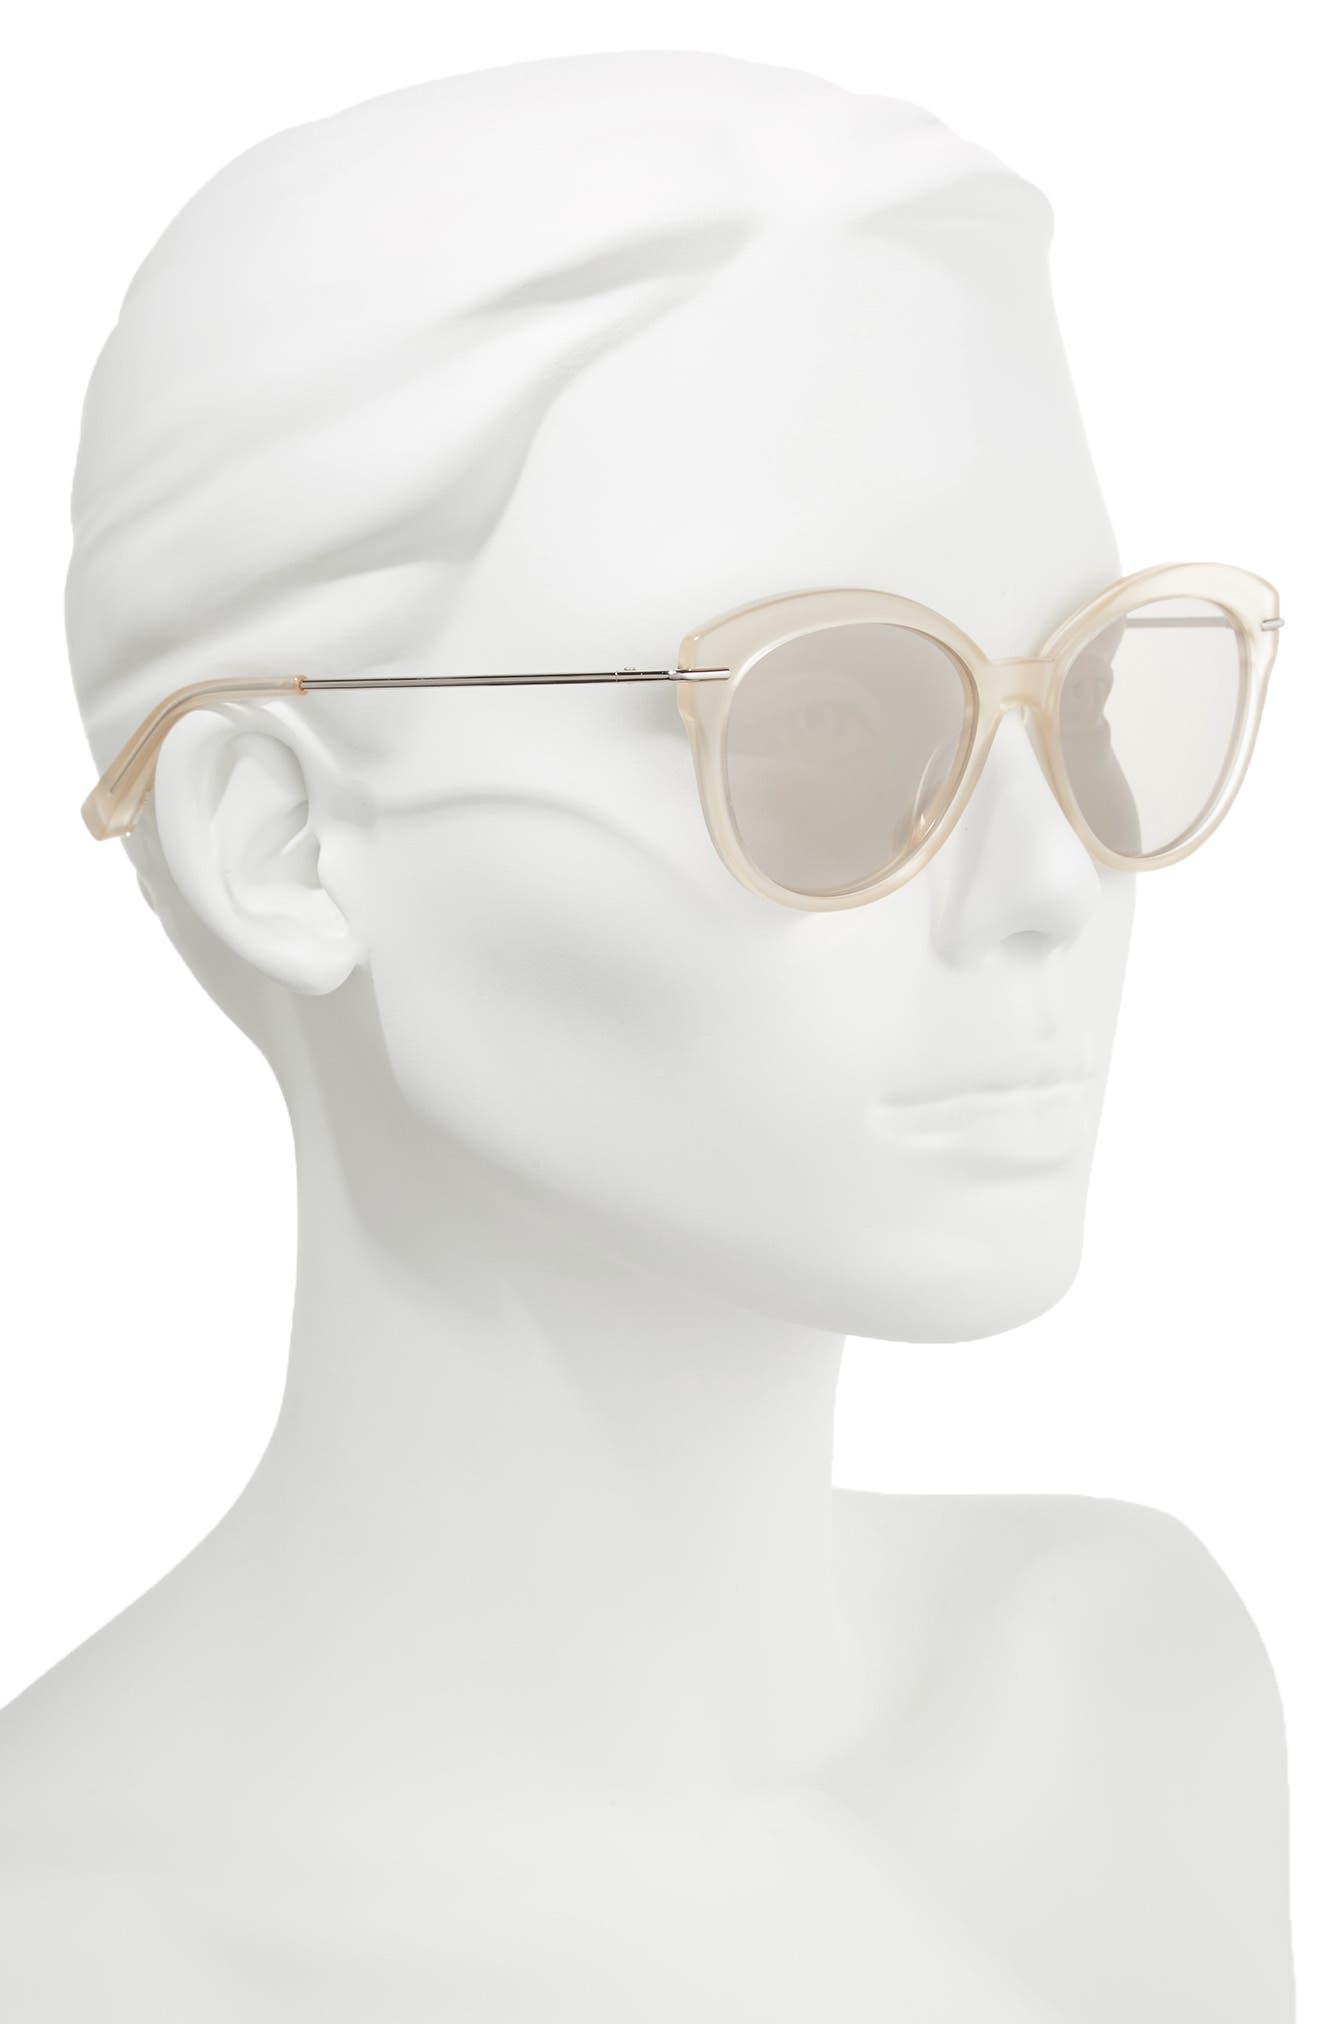 Wright 53mm Cat Eye Sunglasses,                             Alternate thumbnail 3, color,                             Lemon